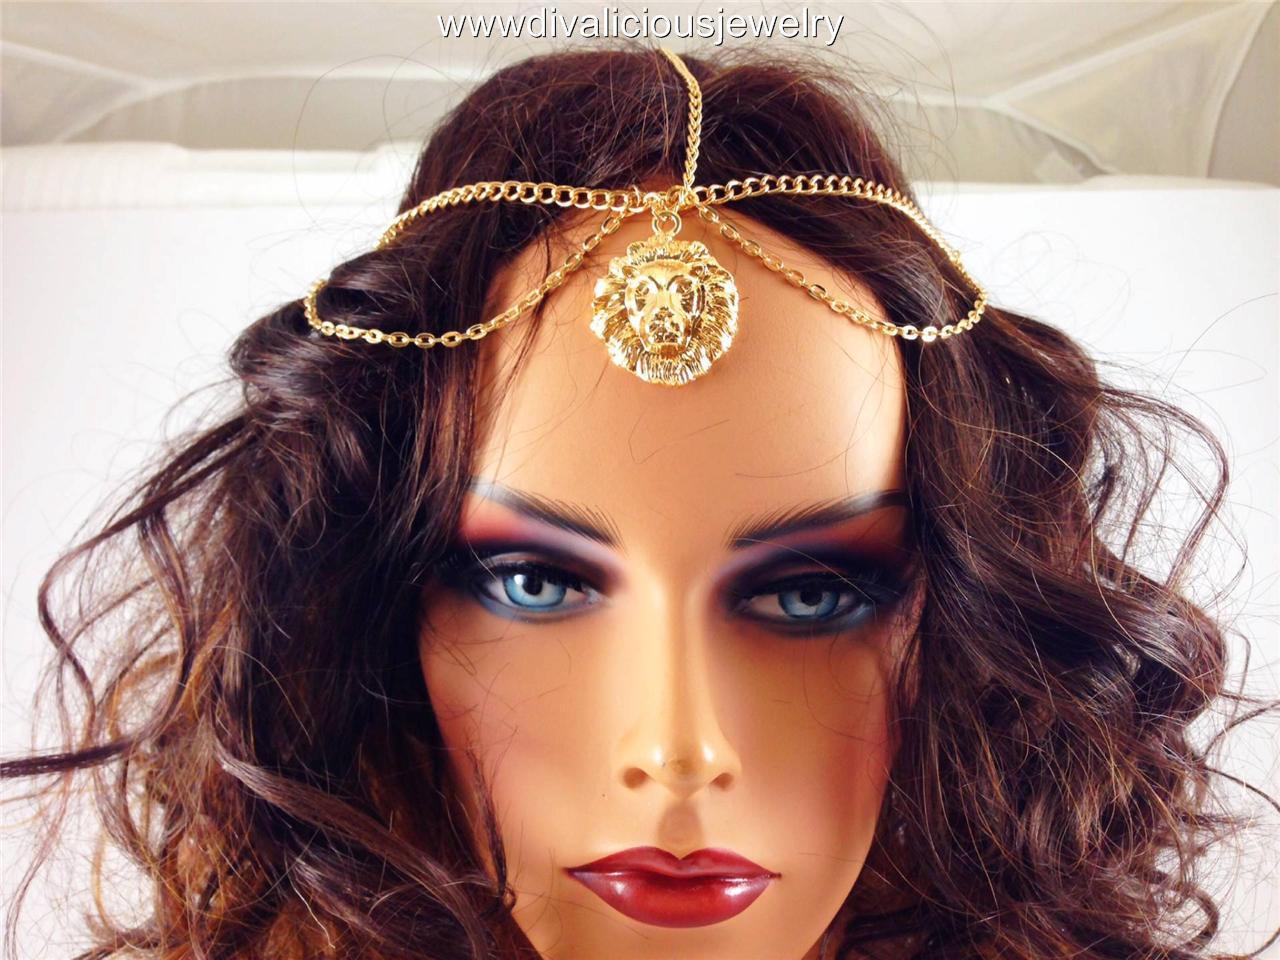 Lion Diva Head Chain - Gold or Silver